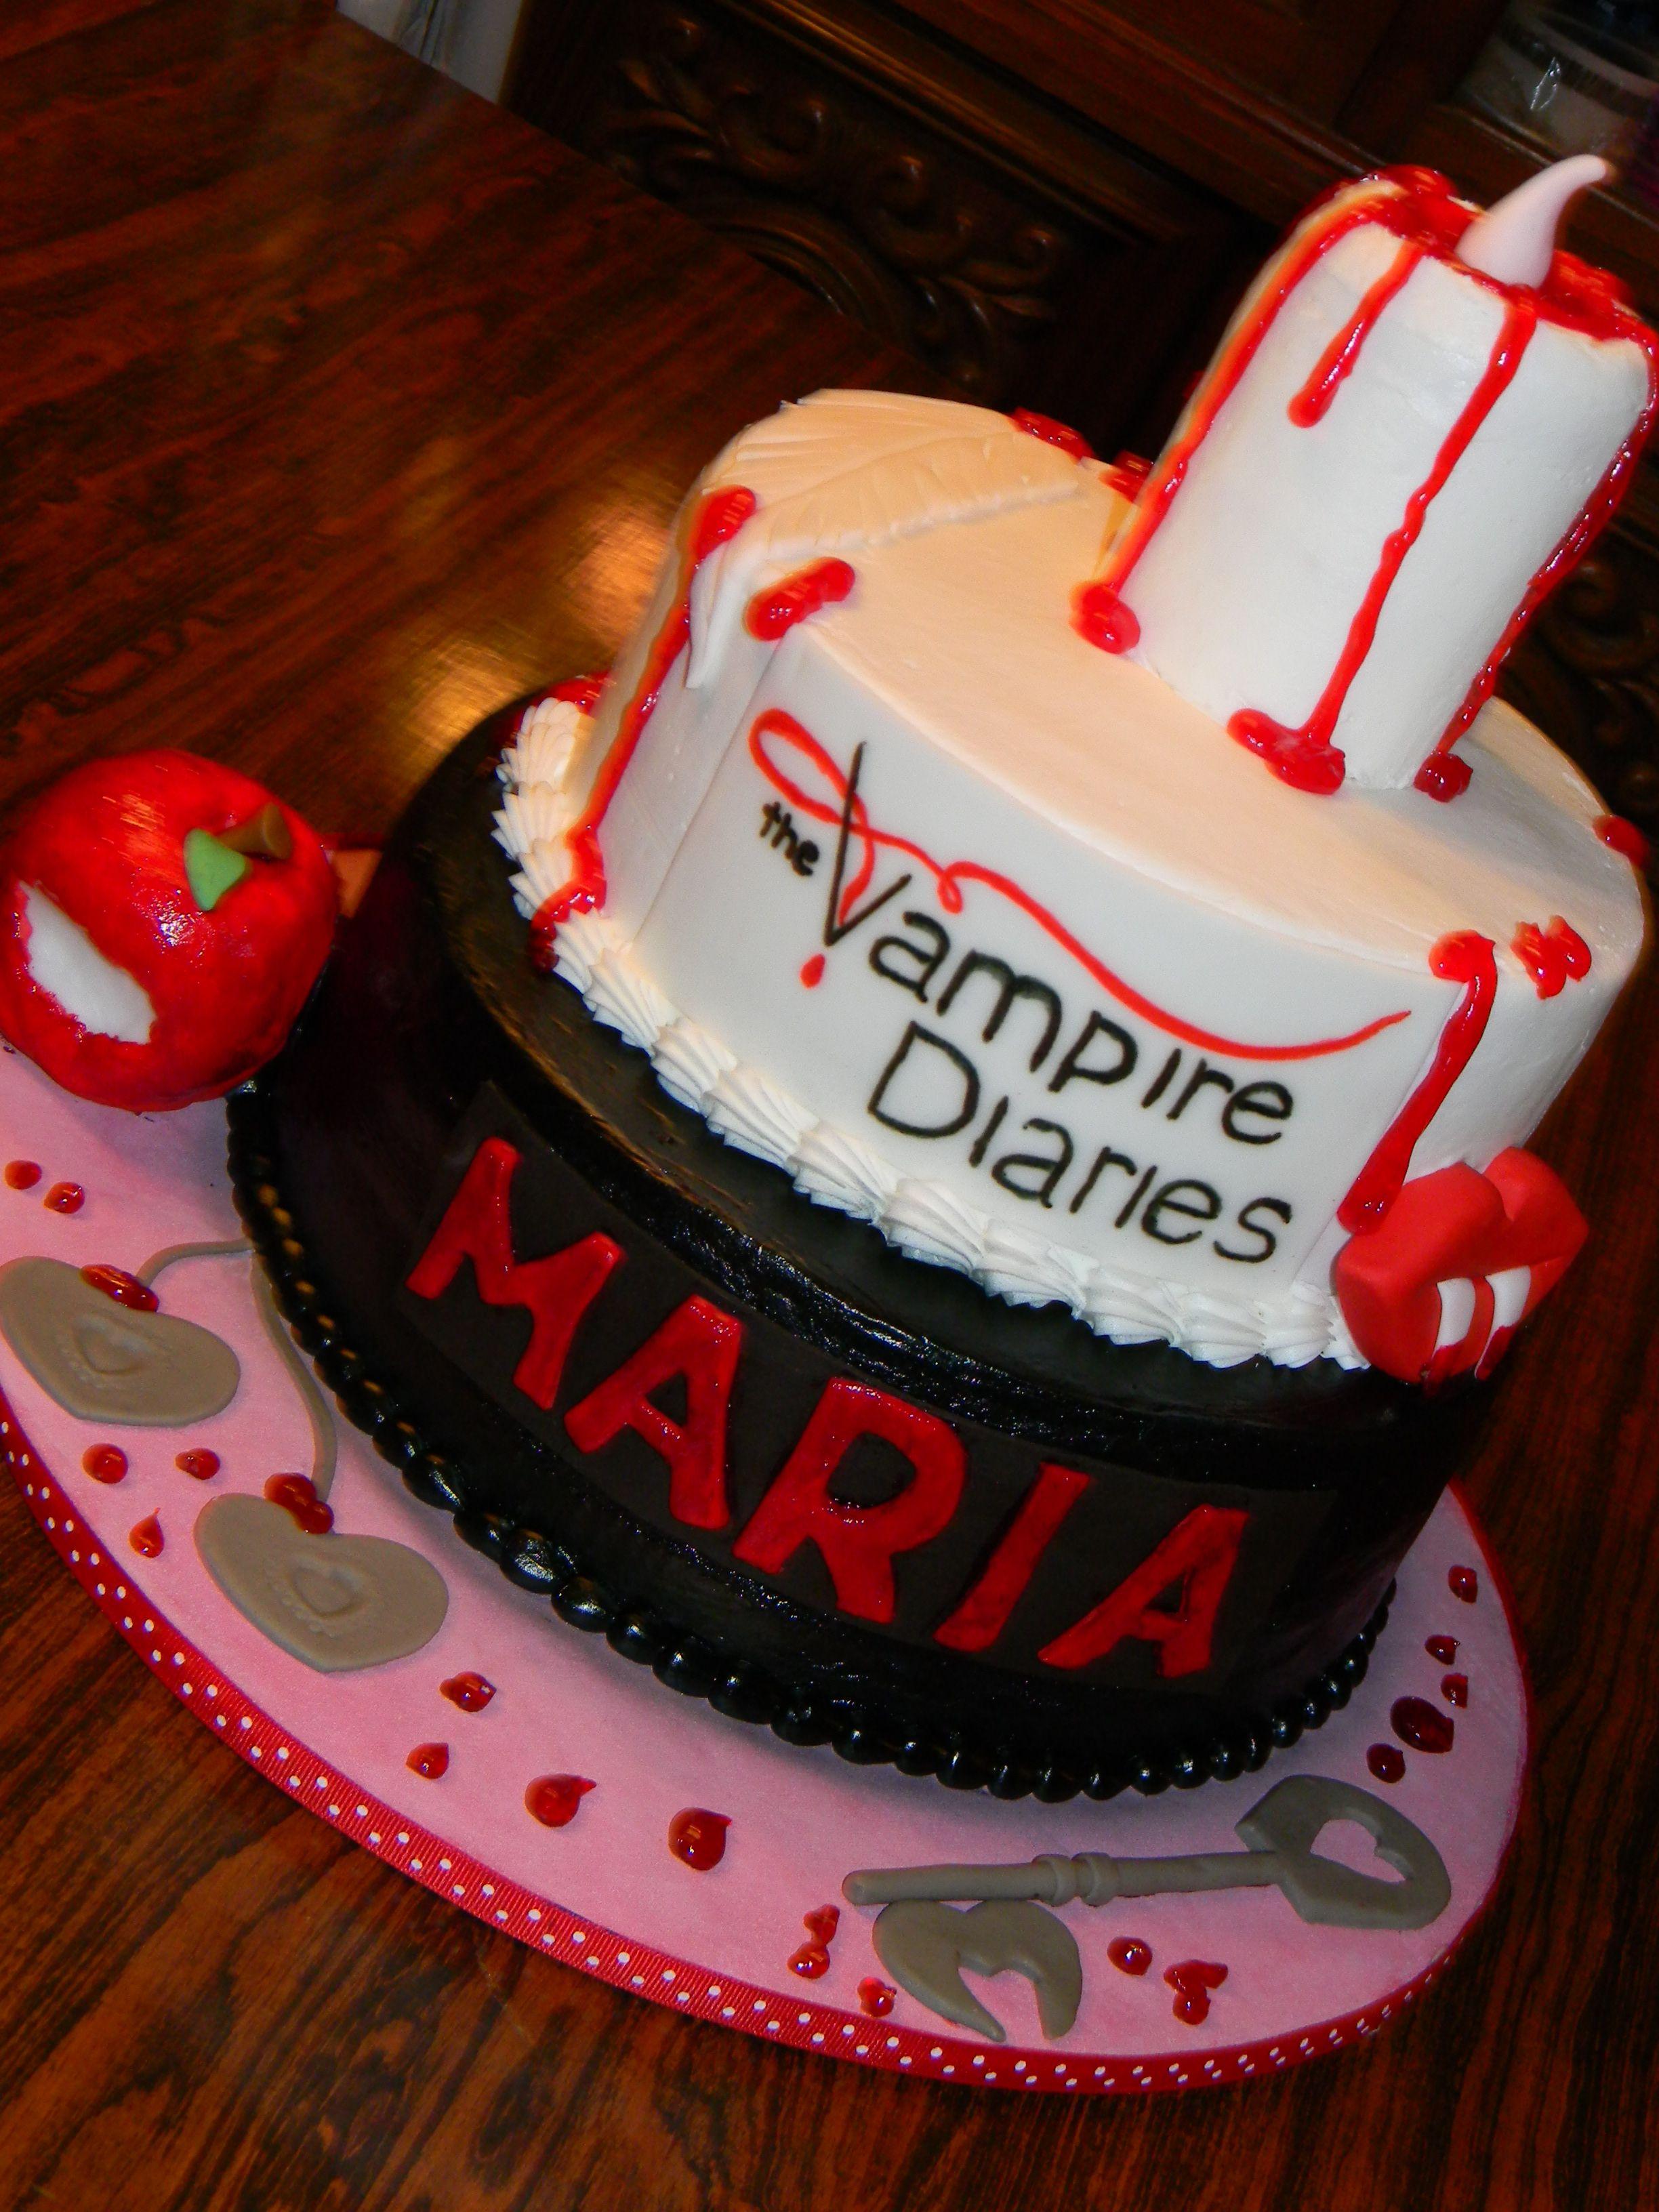 Vampire Diaries Cake Cakes Pinterest Cake Birthdays And